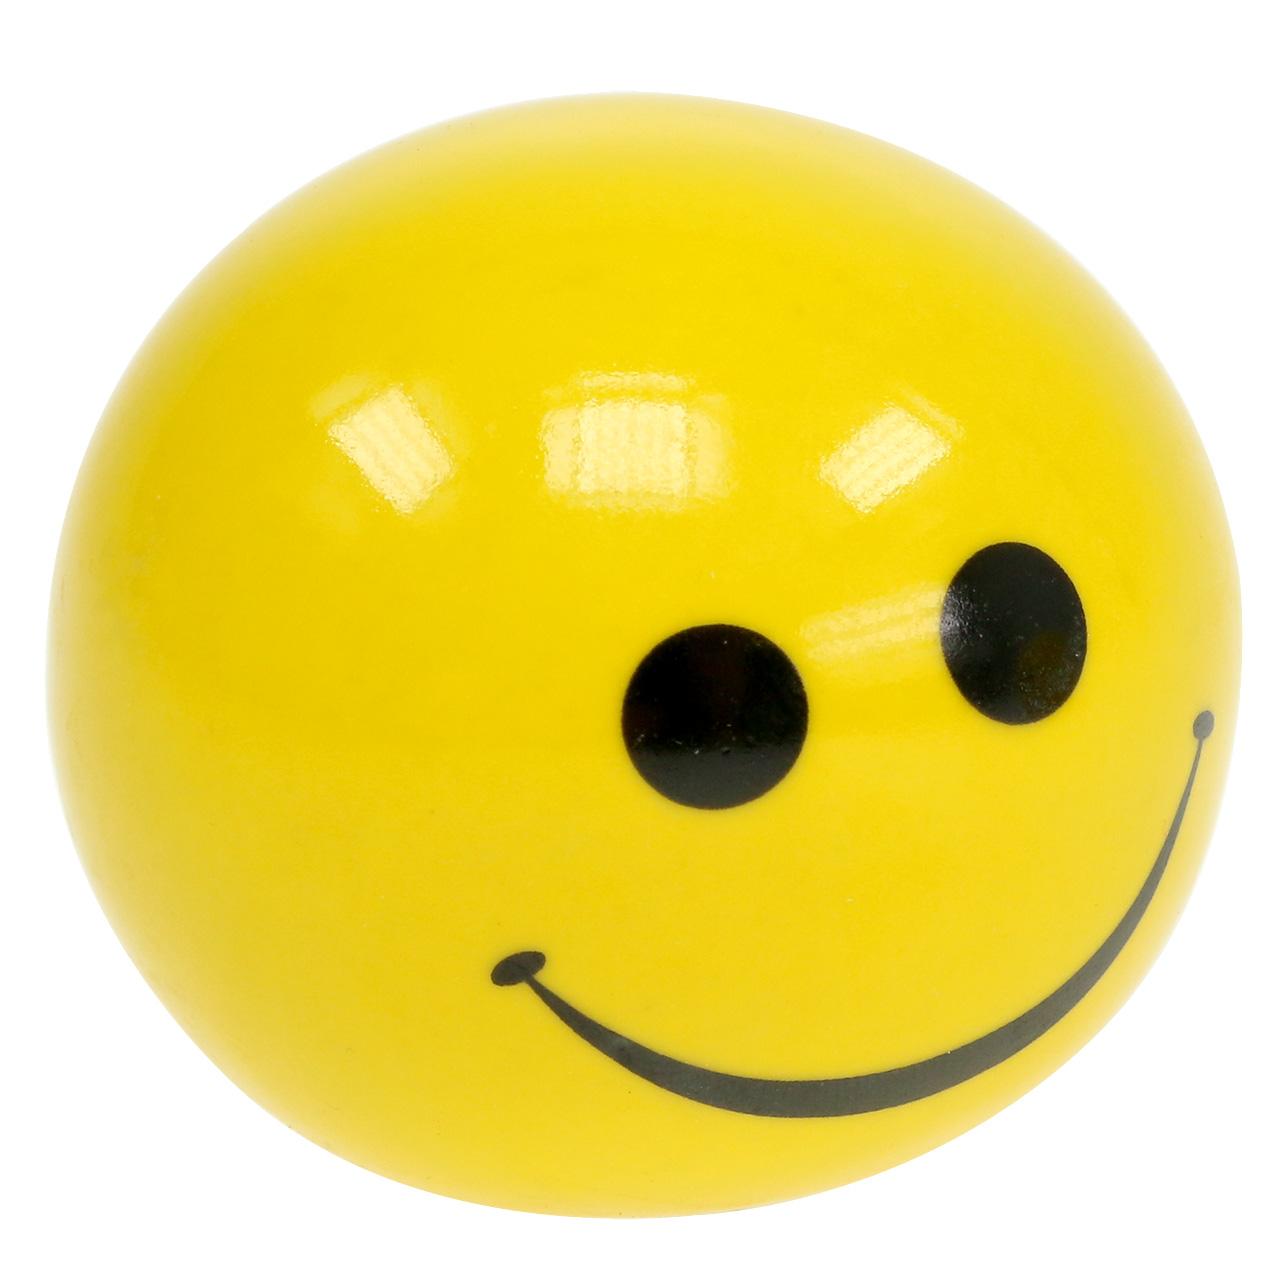 Keramisk kula med Smeili gul Ø5cm H4,5cm 6st